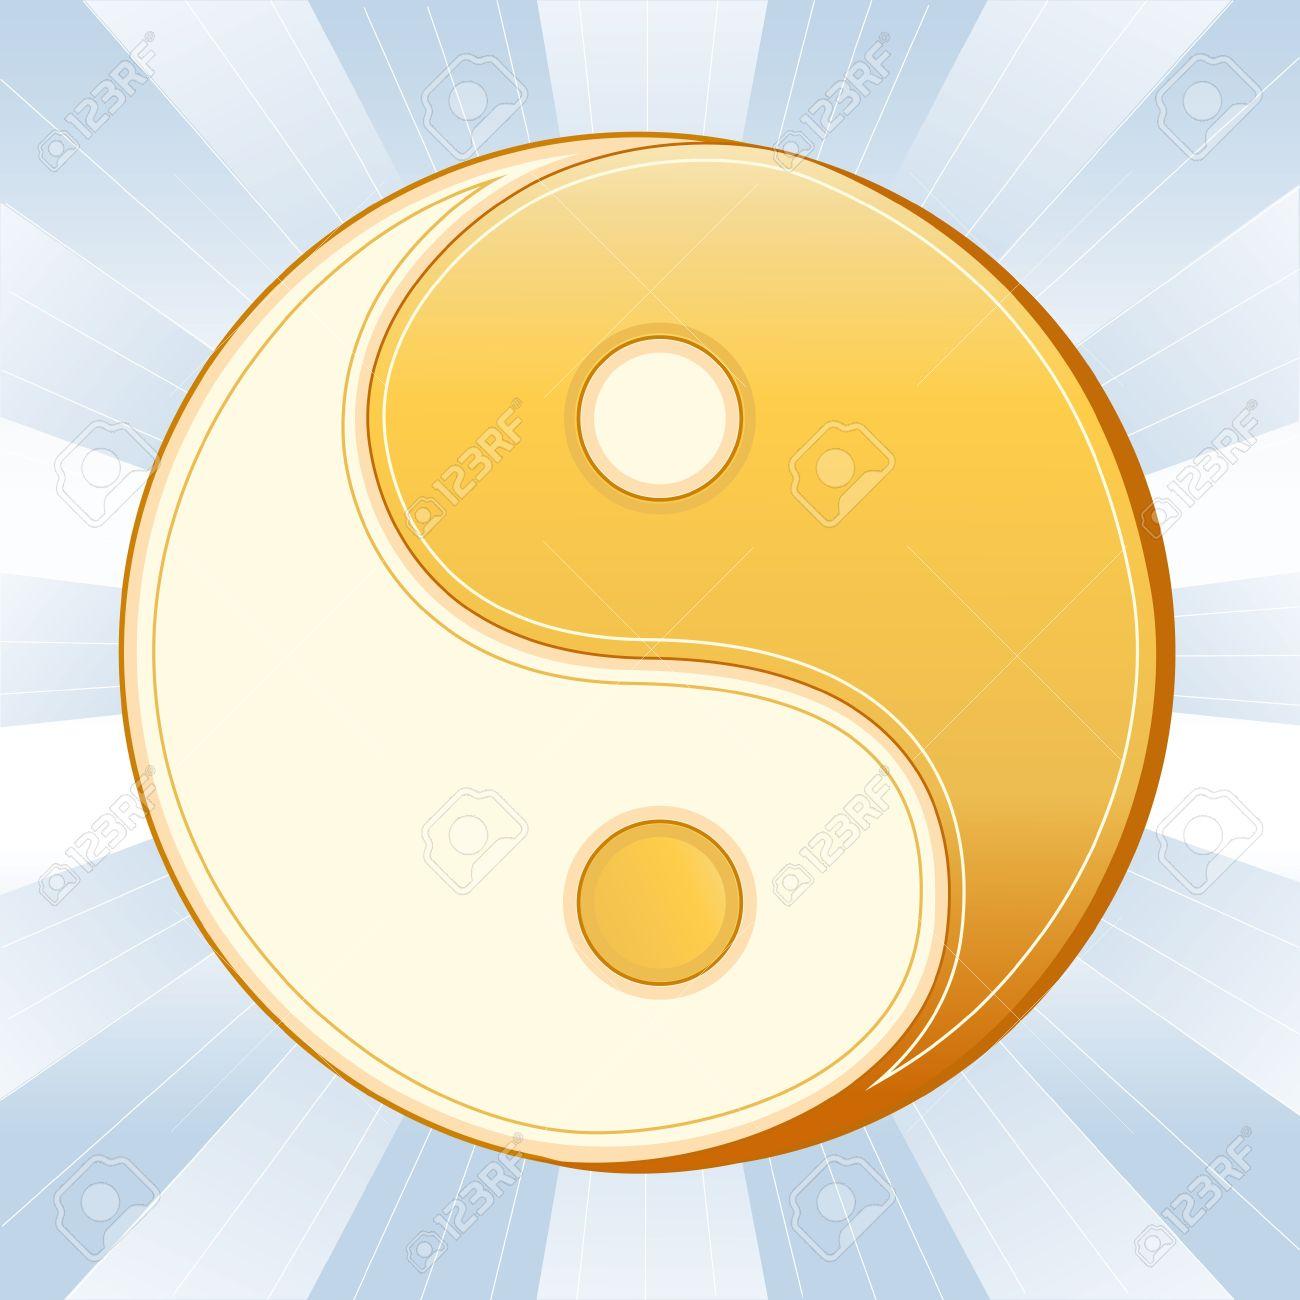 Taoism Symbol, Golden Yin Yang Mandala, icon of Tao faith on a sky blue ray background. Stock Vector - 11837258